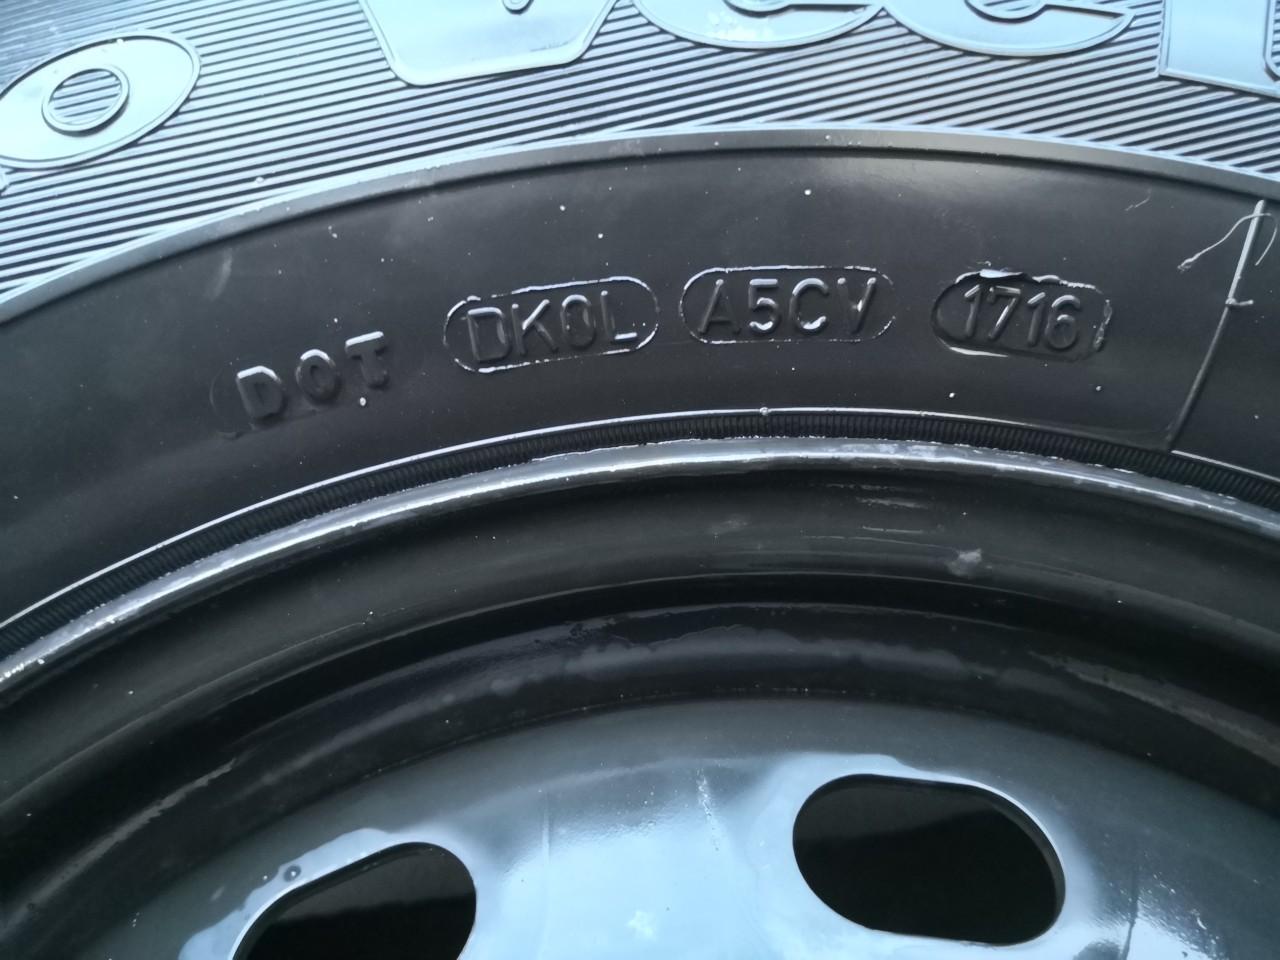 Roti jante+anvelope 215 65 16C, Good year cargo van profil intre 5.5 - 8 mm dot 1716 + 4 capace.